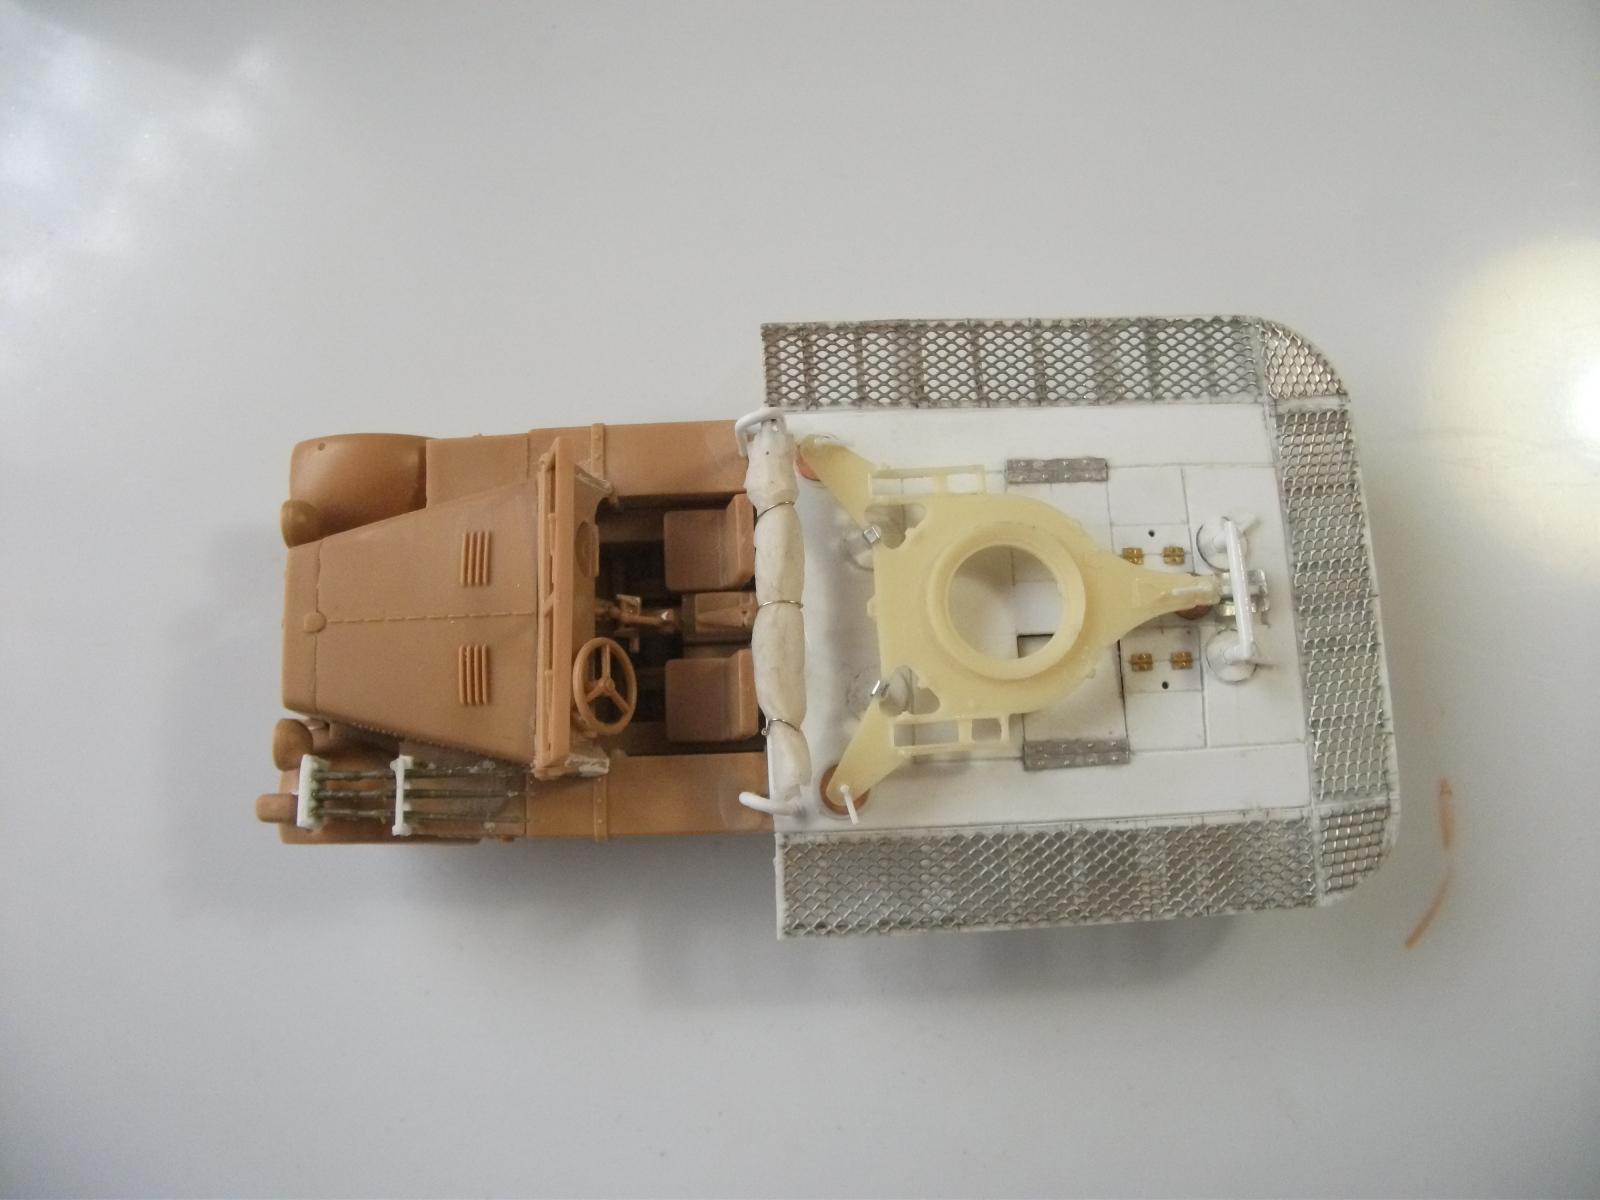 sdkfz - SdKfz 10/4, Krupp Protze et fieldkitchen au 1/48 DSCF1083